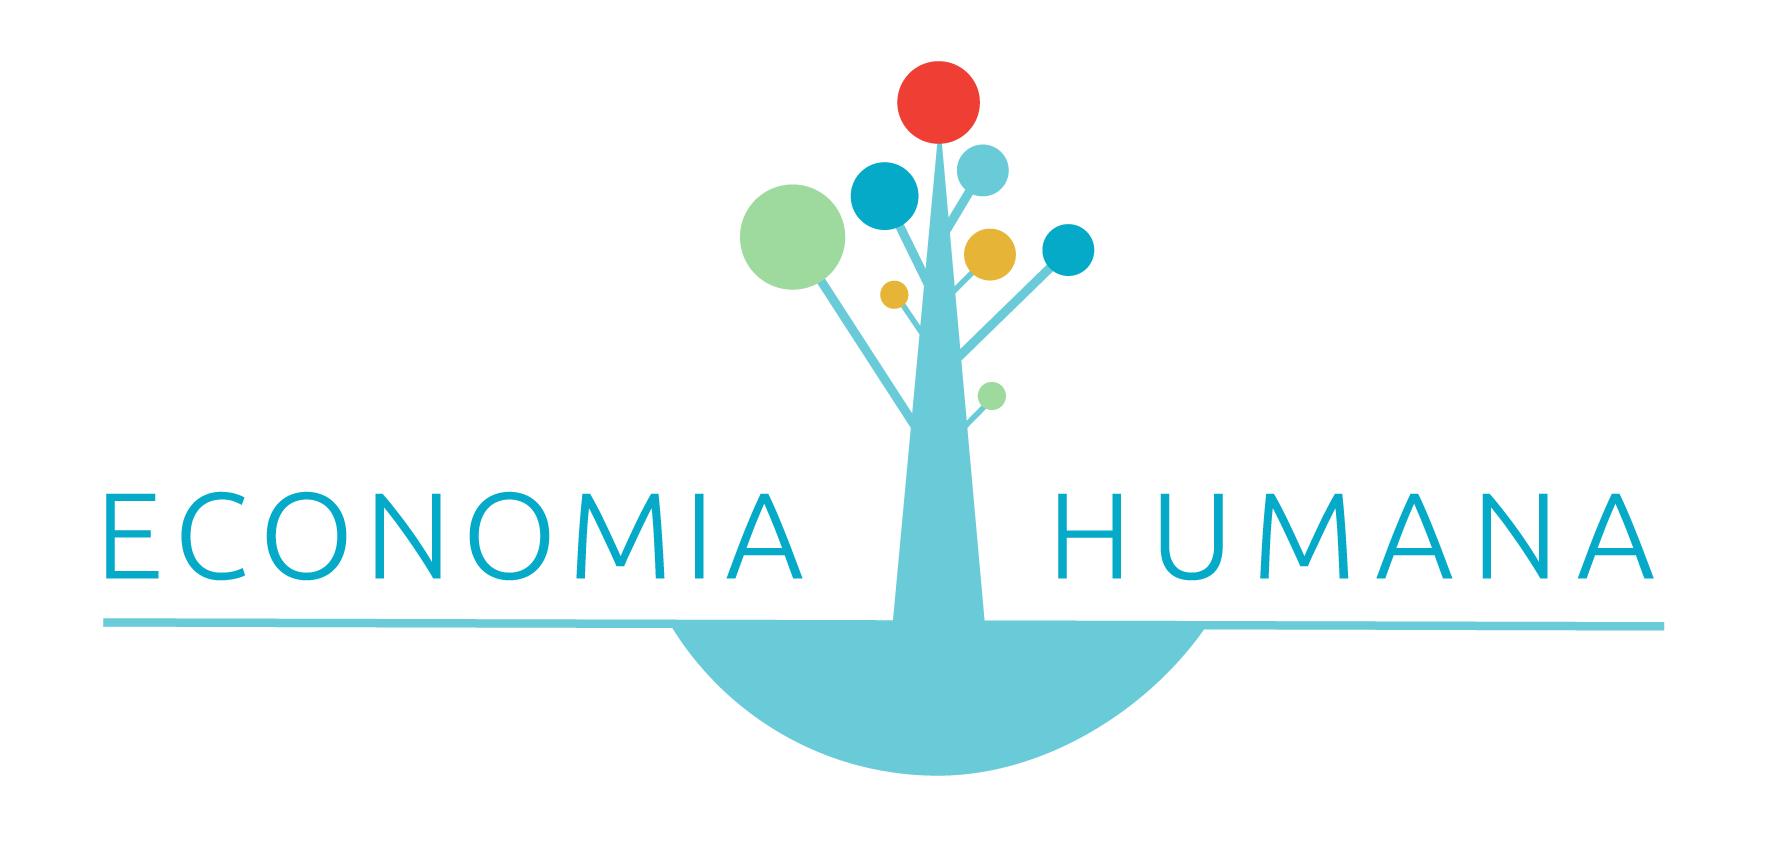 Economia Humana